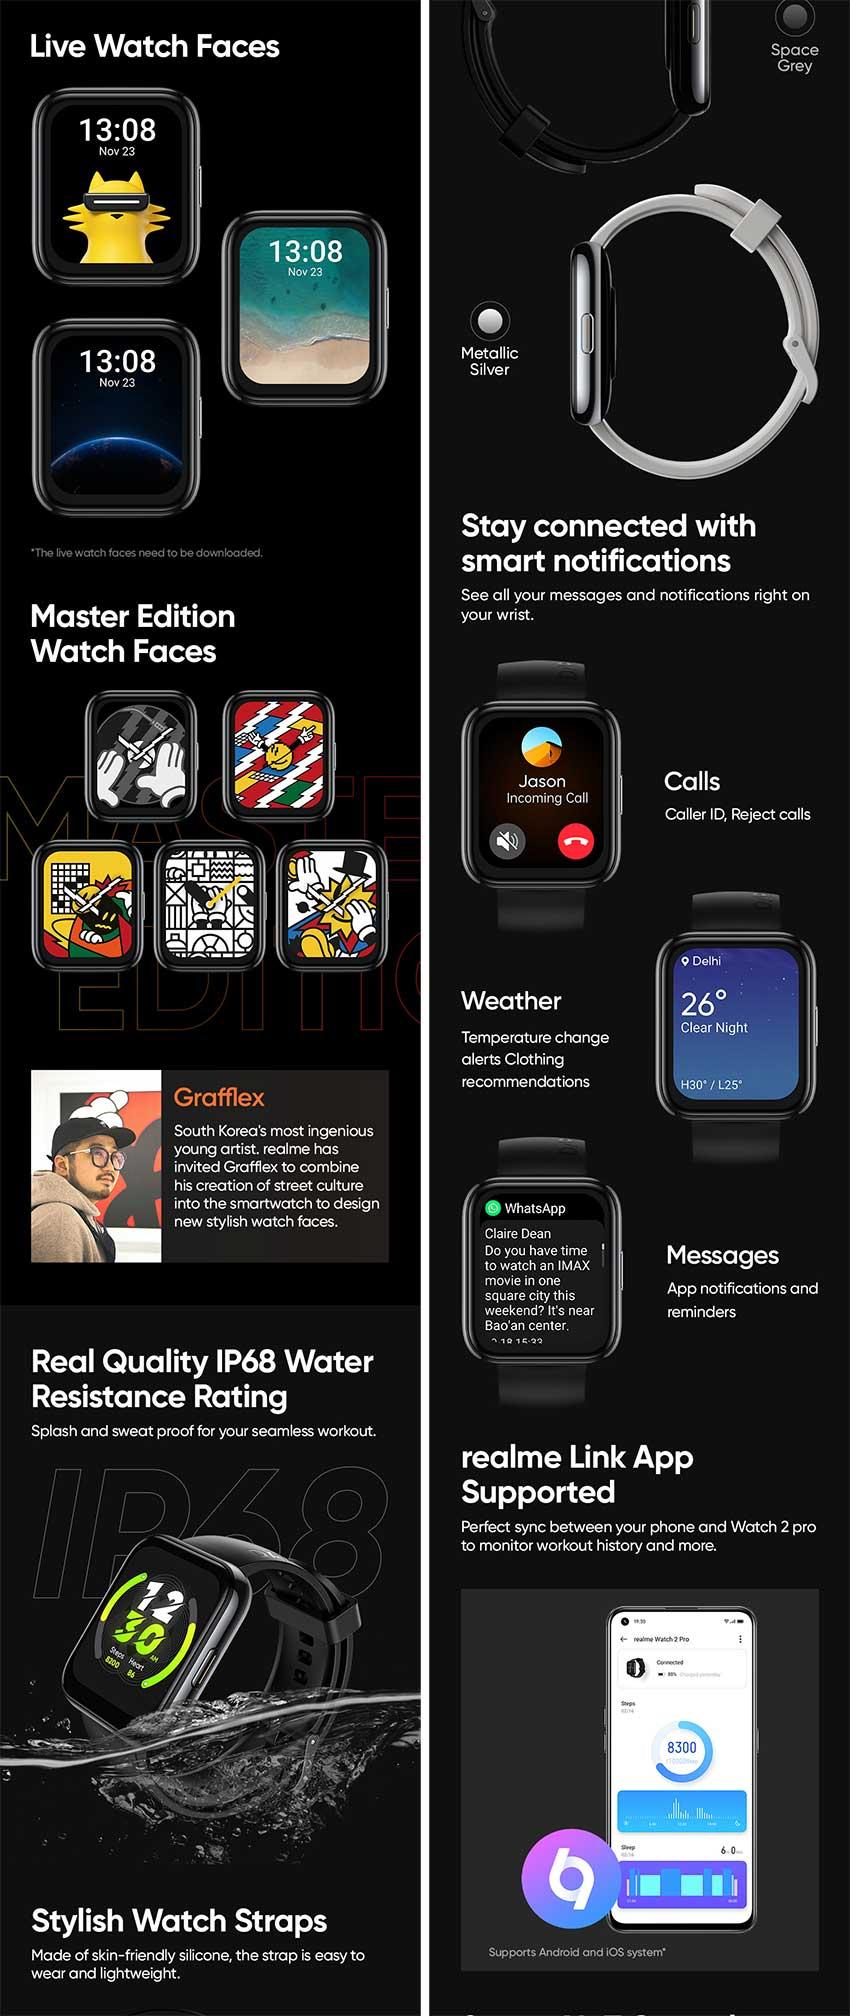 Realme-Watch-2-Pro-02.jpg?1627731347916